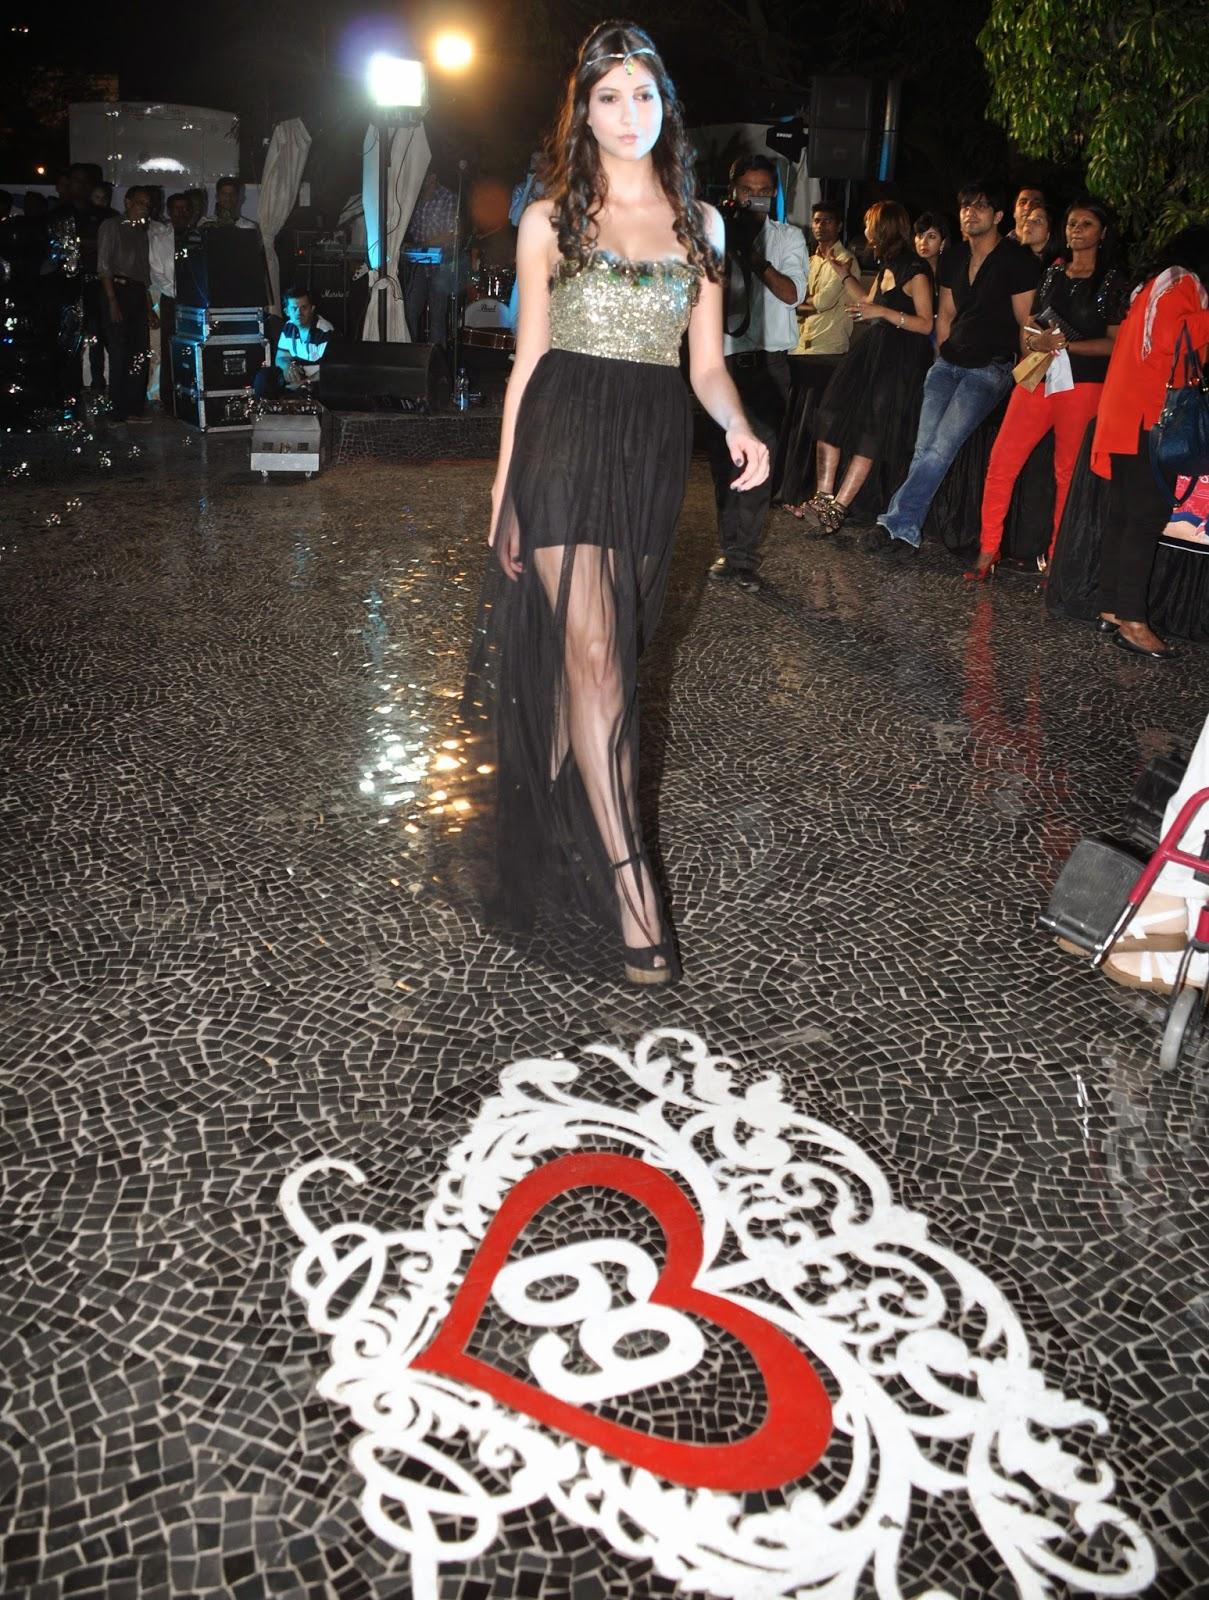 Model for Simply Simone at Villa 69